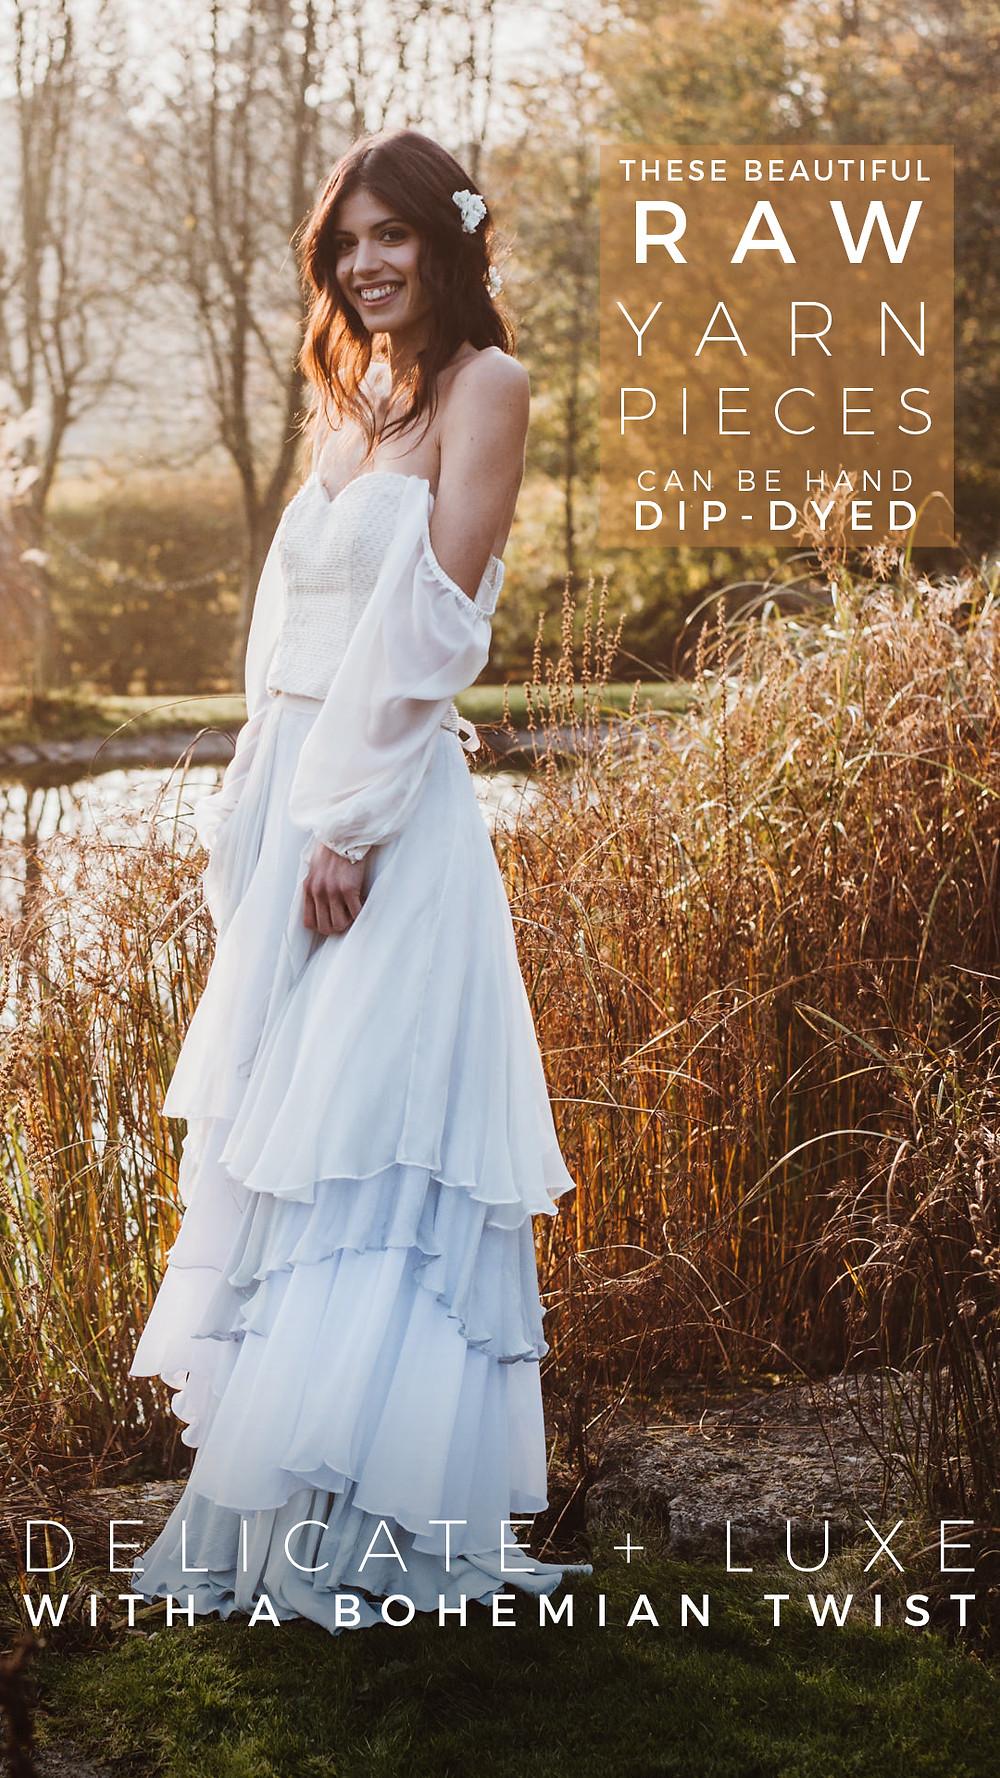 Dip dye wedding dress by Jessica Turner Designs